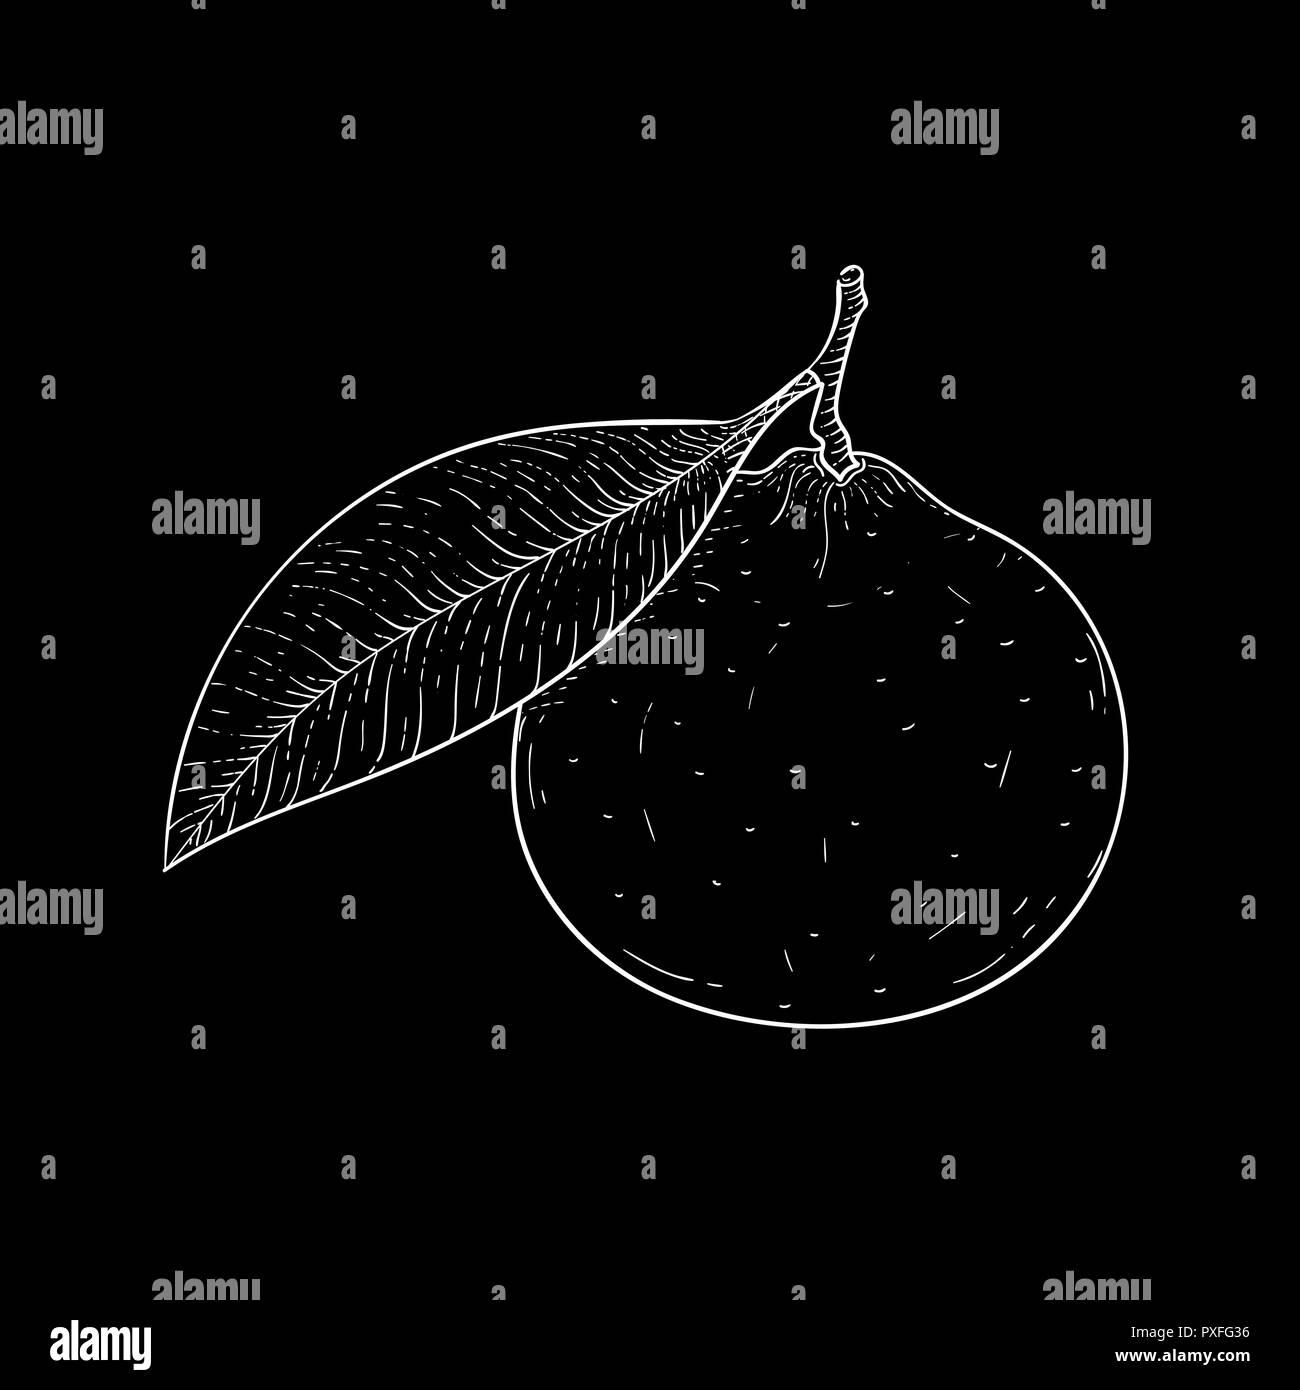 Tangerine. Hand drawn sketch, outline vector illustration on black background - Stock Image